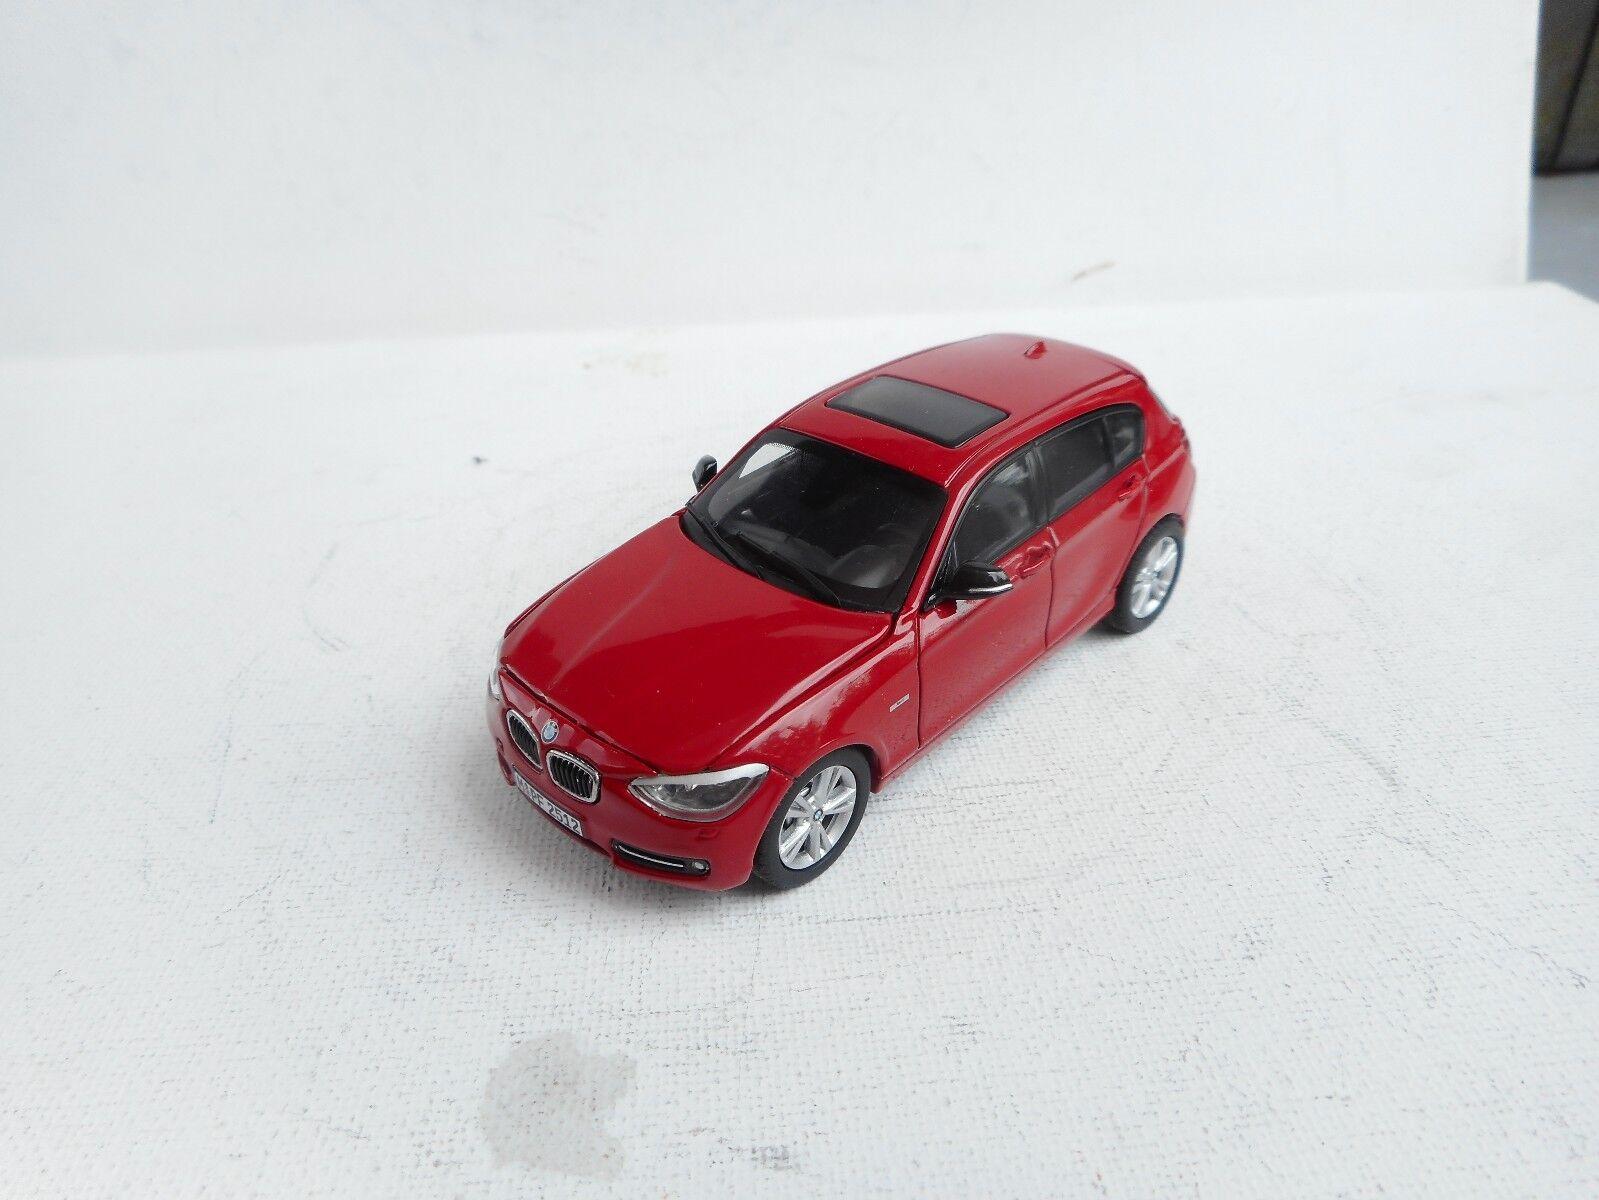 connotación de lujo discreta BMW 1 SERIES 2011 F20 125i SPORT rojo 1 1 1 43 PARAGON (DEALER MODEL) OHNE BOX  estilo clásico